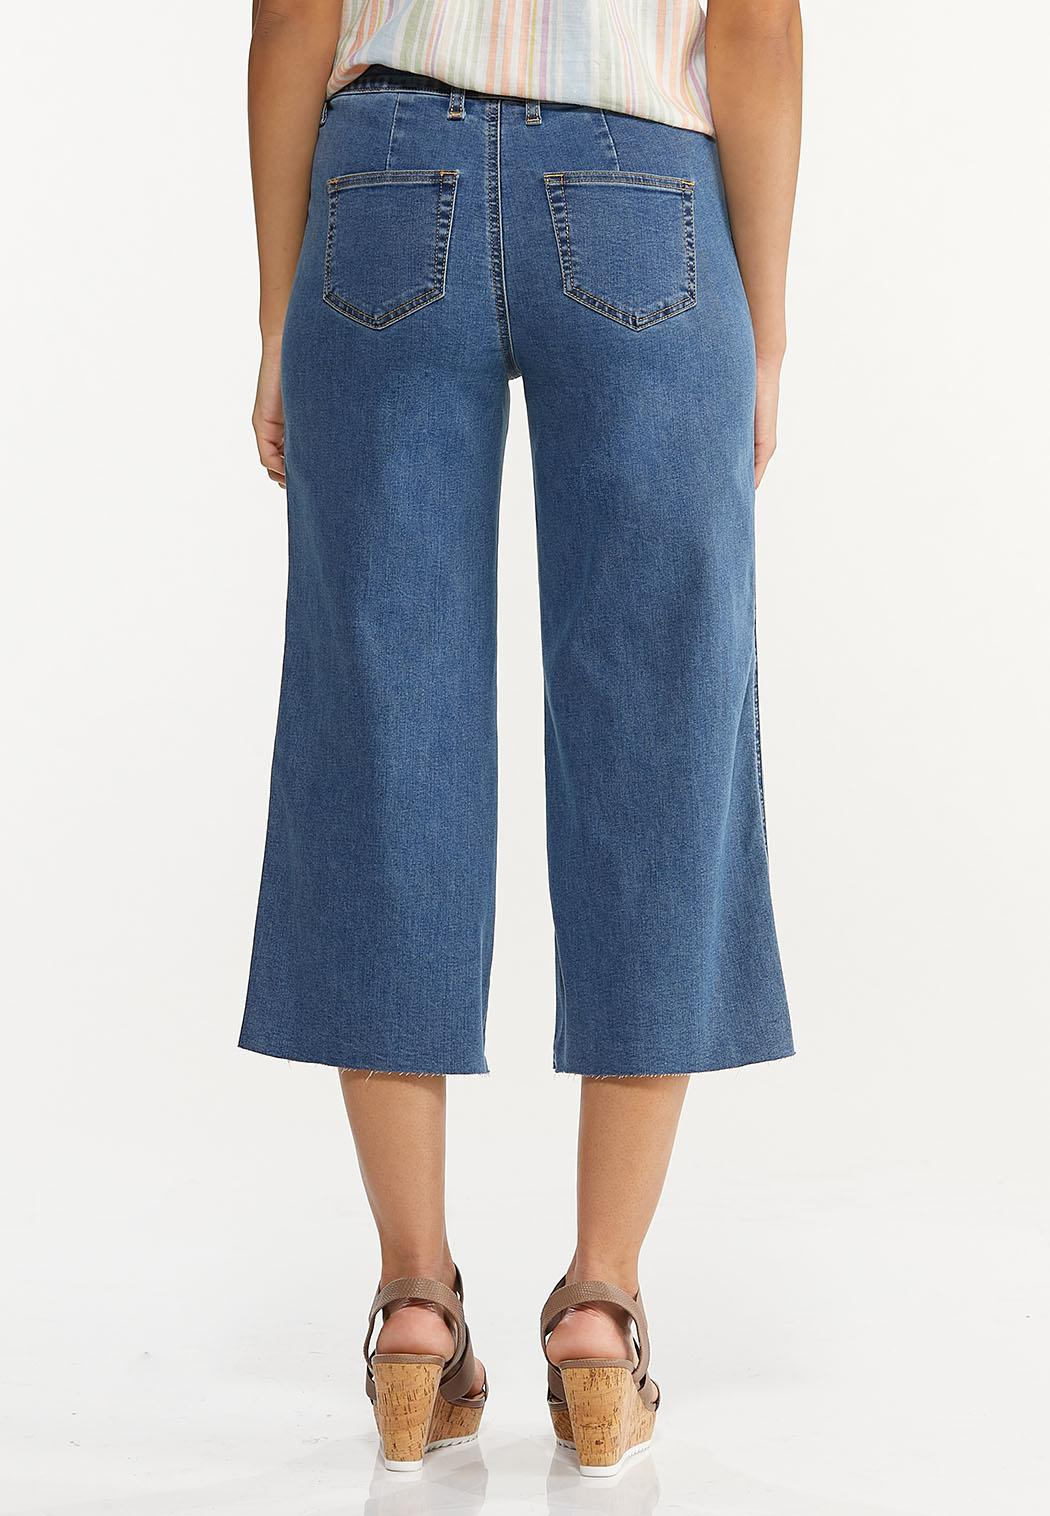 Cropped Wide Leg Jeans (Item #44551843)